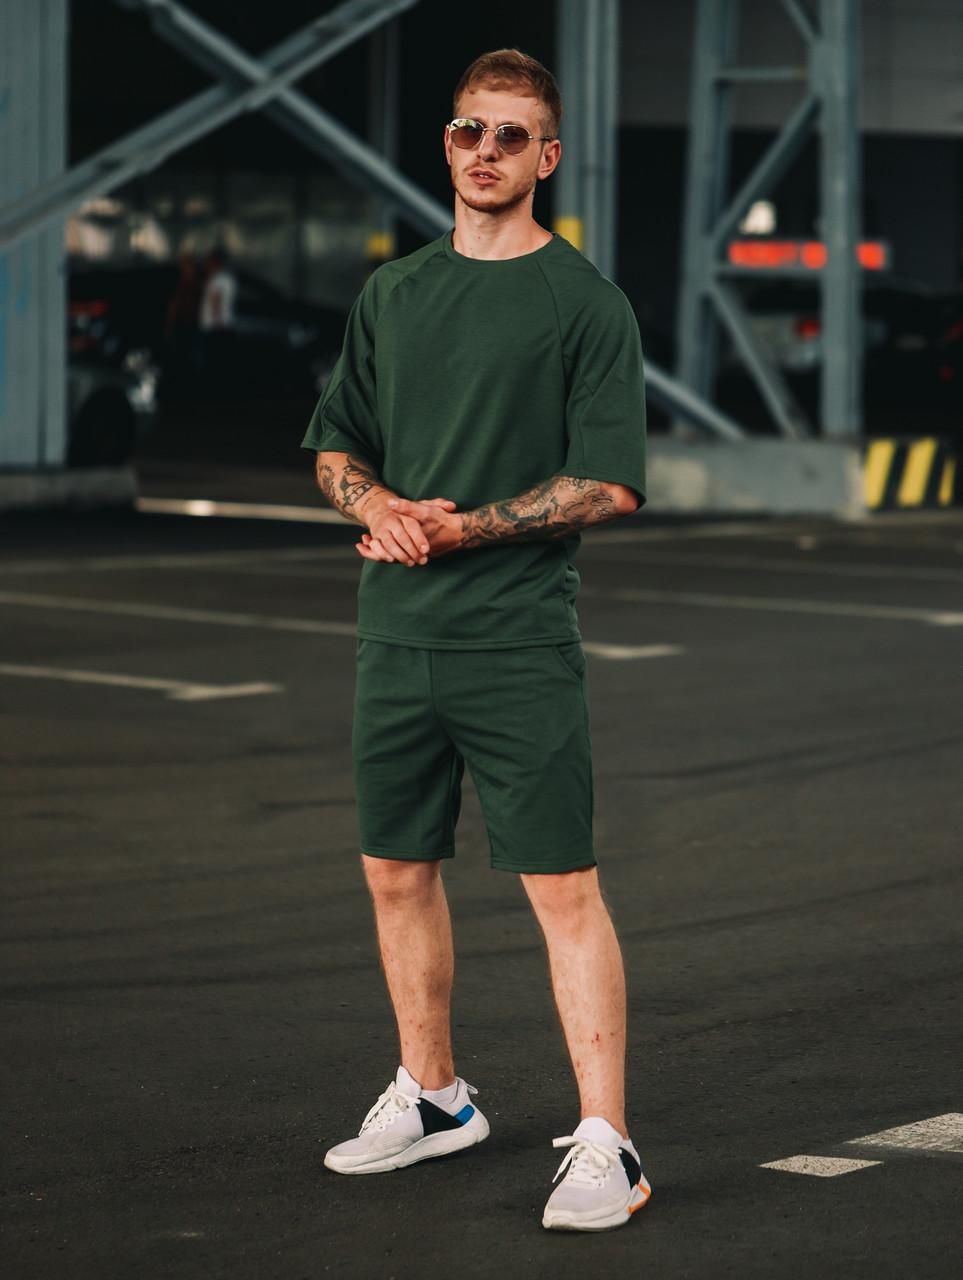 Мужской летний комплект OverSize Khaki (шорты и футболка), летний костюм оверсайз